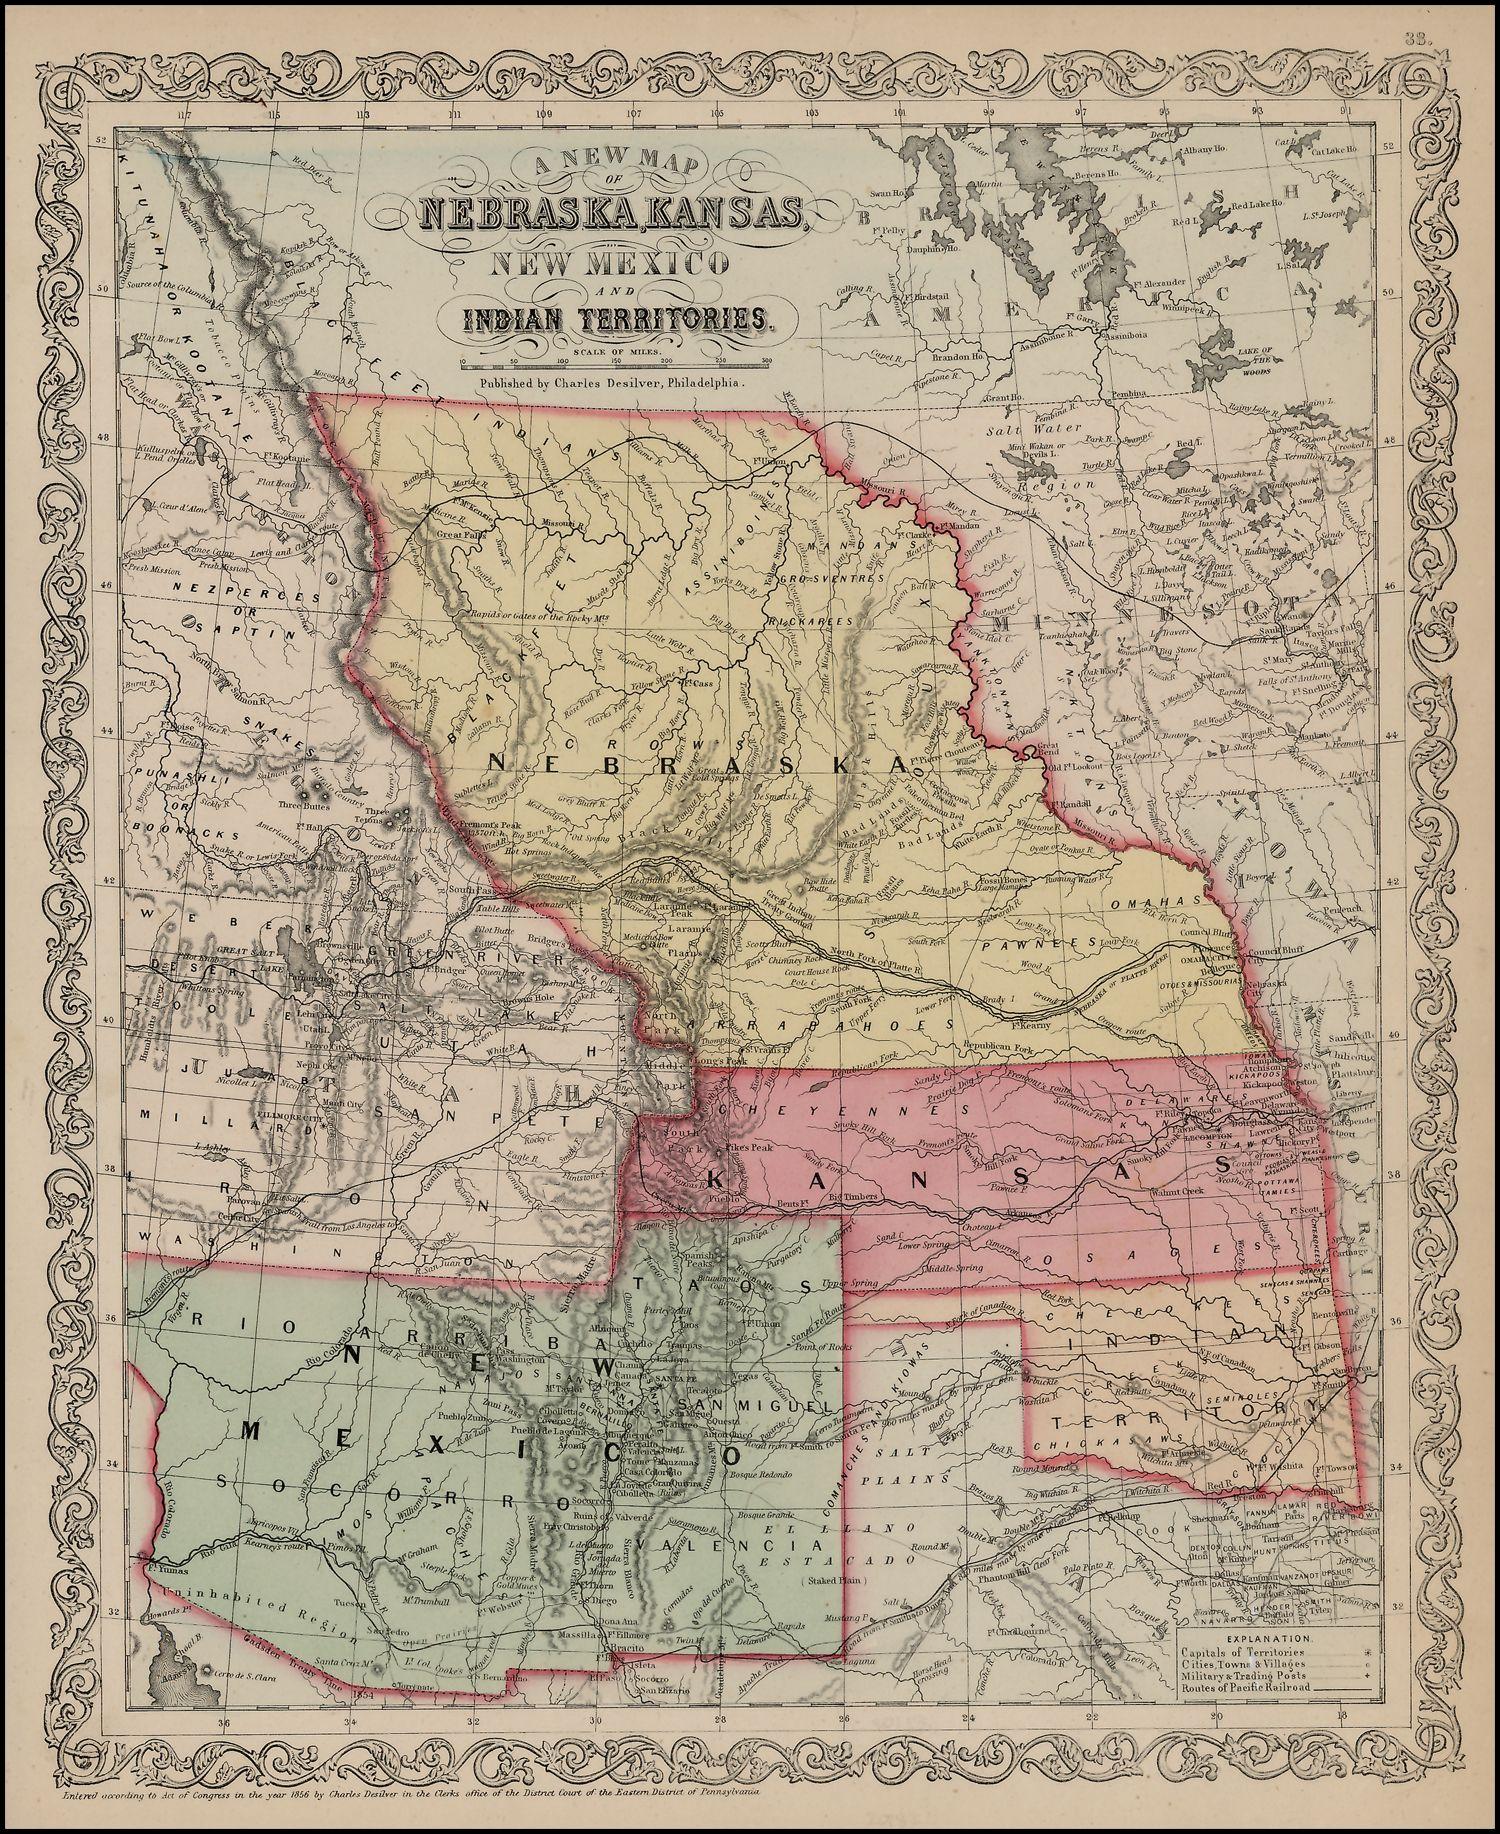 1856 desilver map, nebraska and kansas territory map